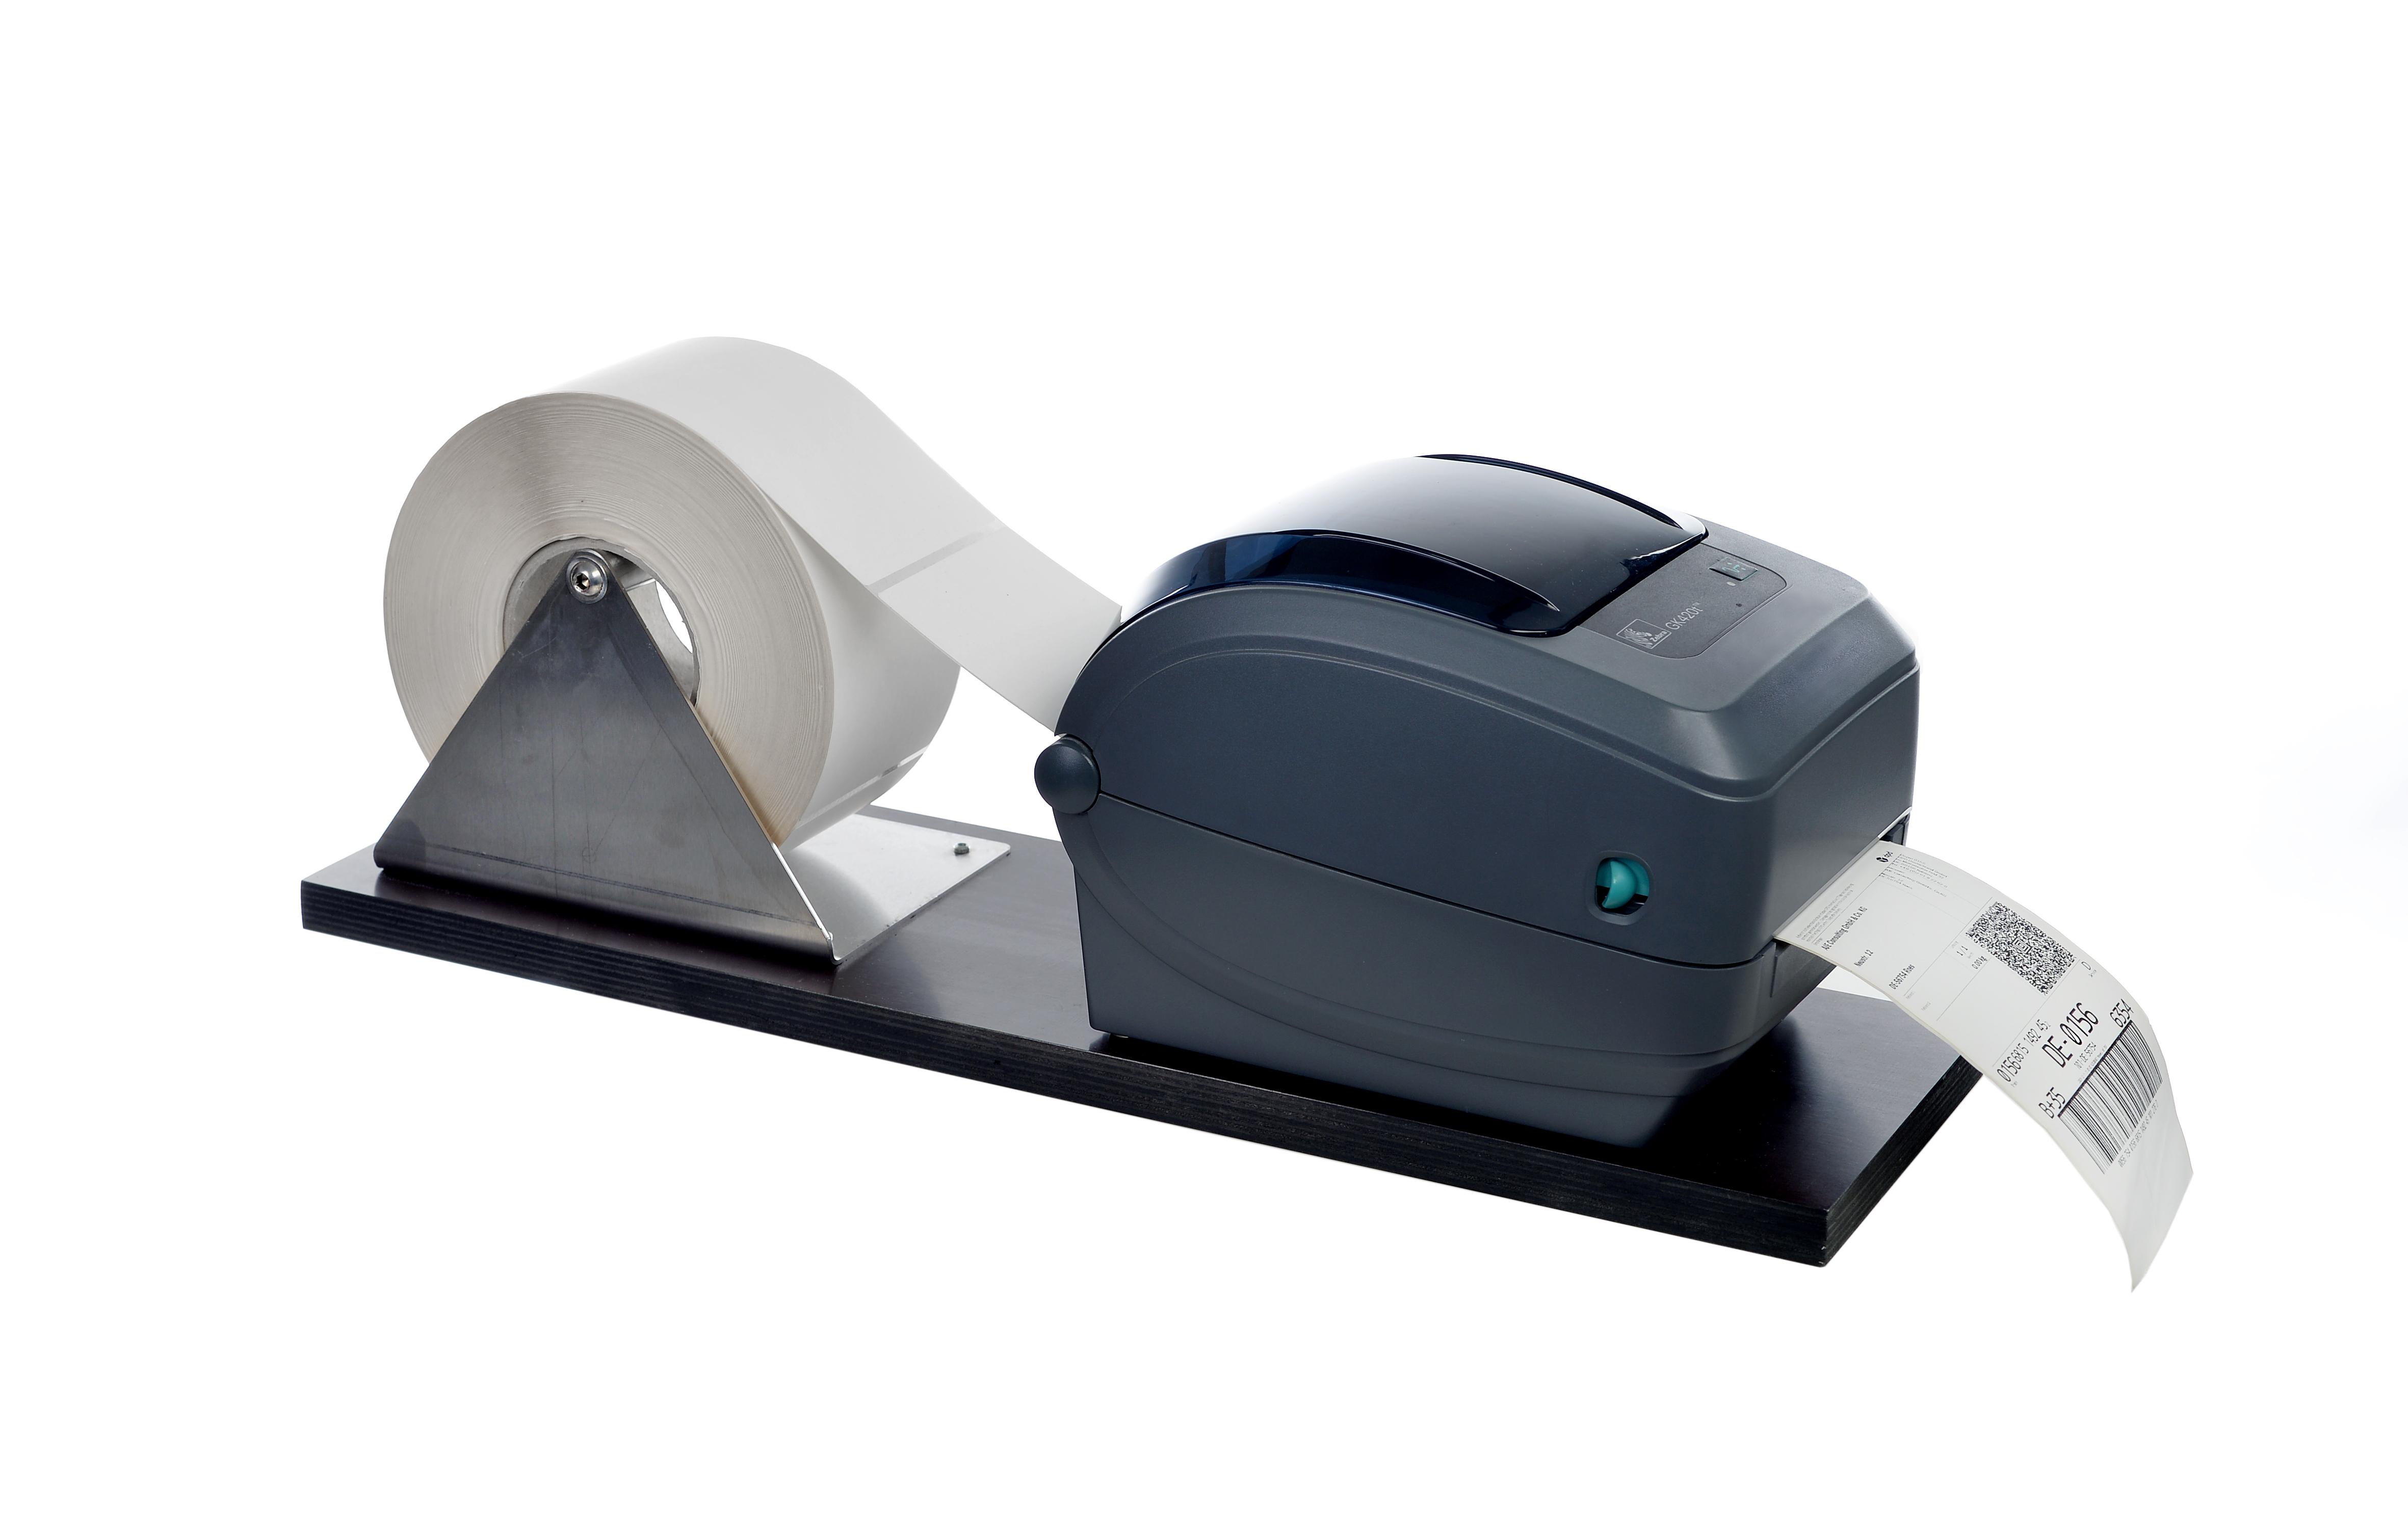 Etikettendrucker Etiketten Drucken Rolle Versandetiketten Rollenhalterung Halterung Versand Logistik Hardware